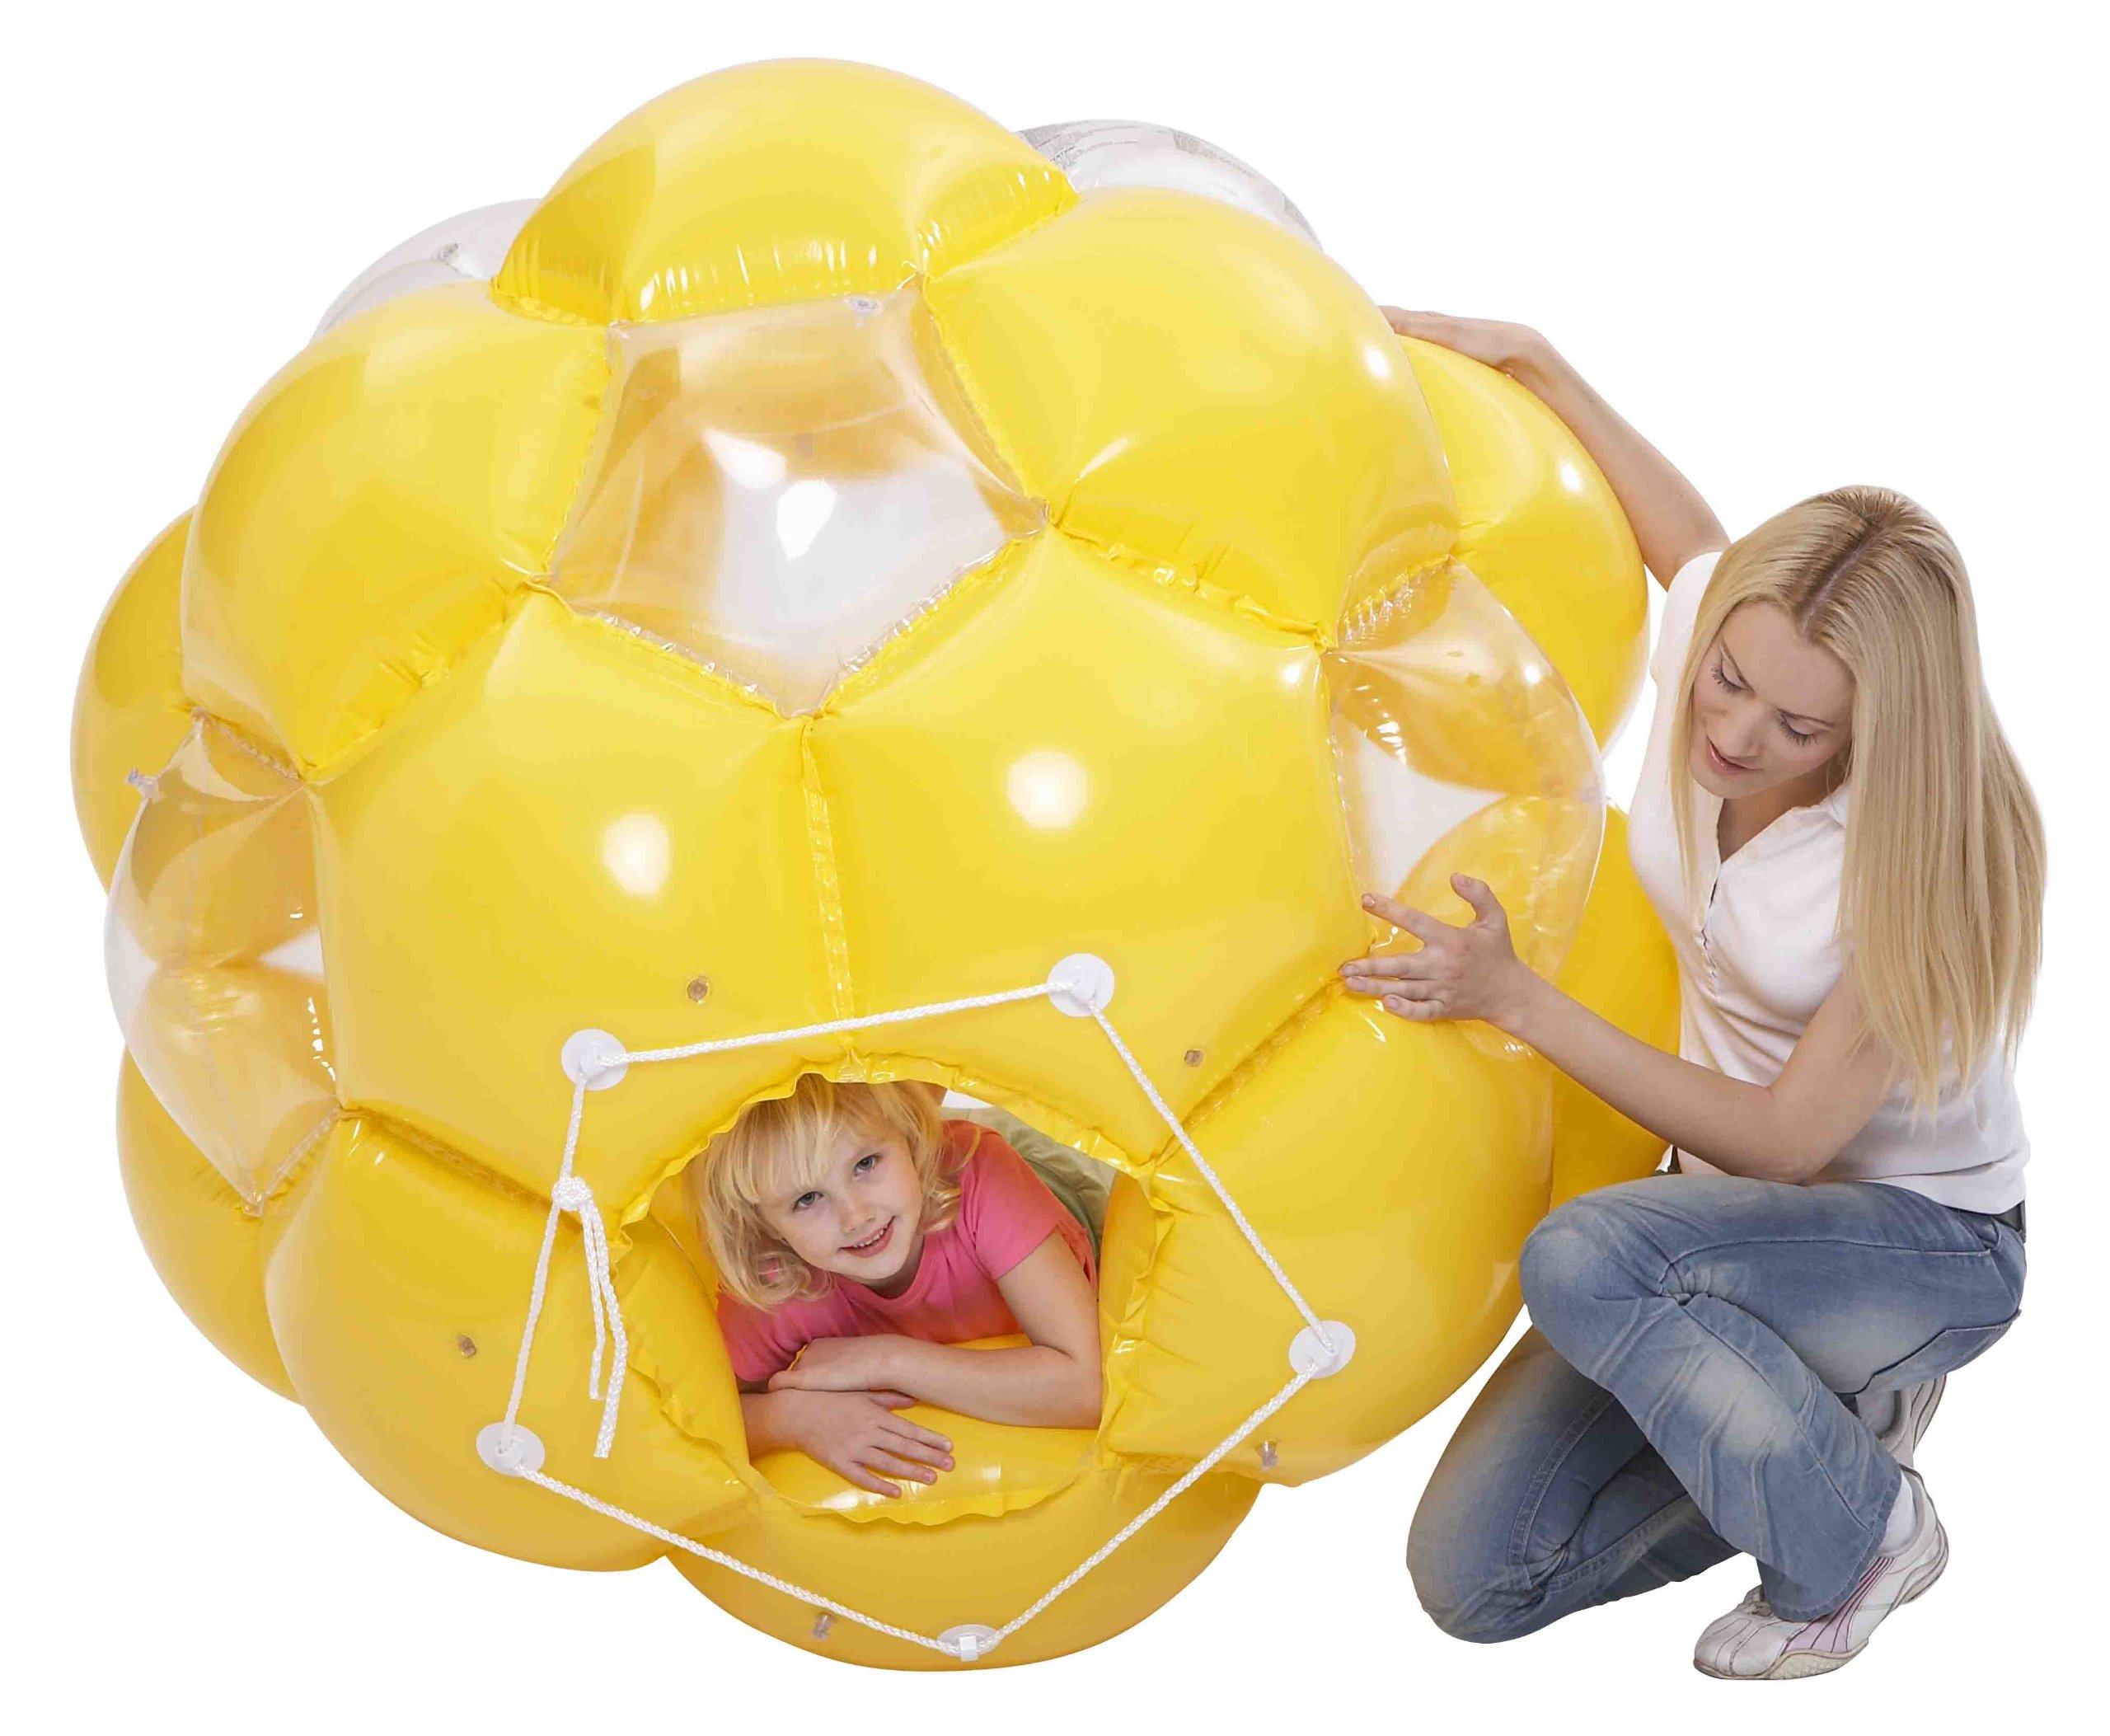 Inflatable Fun Ball - Jumbo 51'' - Giant Crawl Inside Inflatable by Jilong